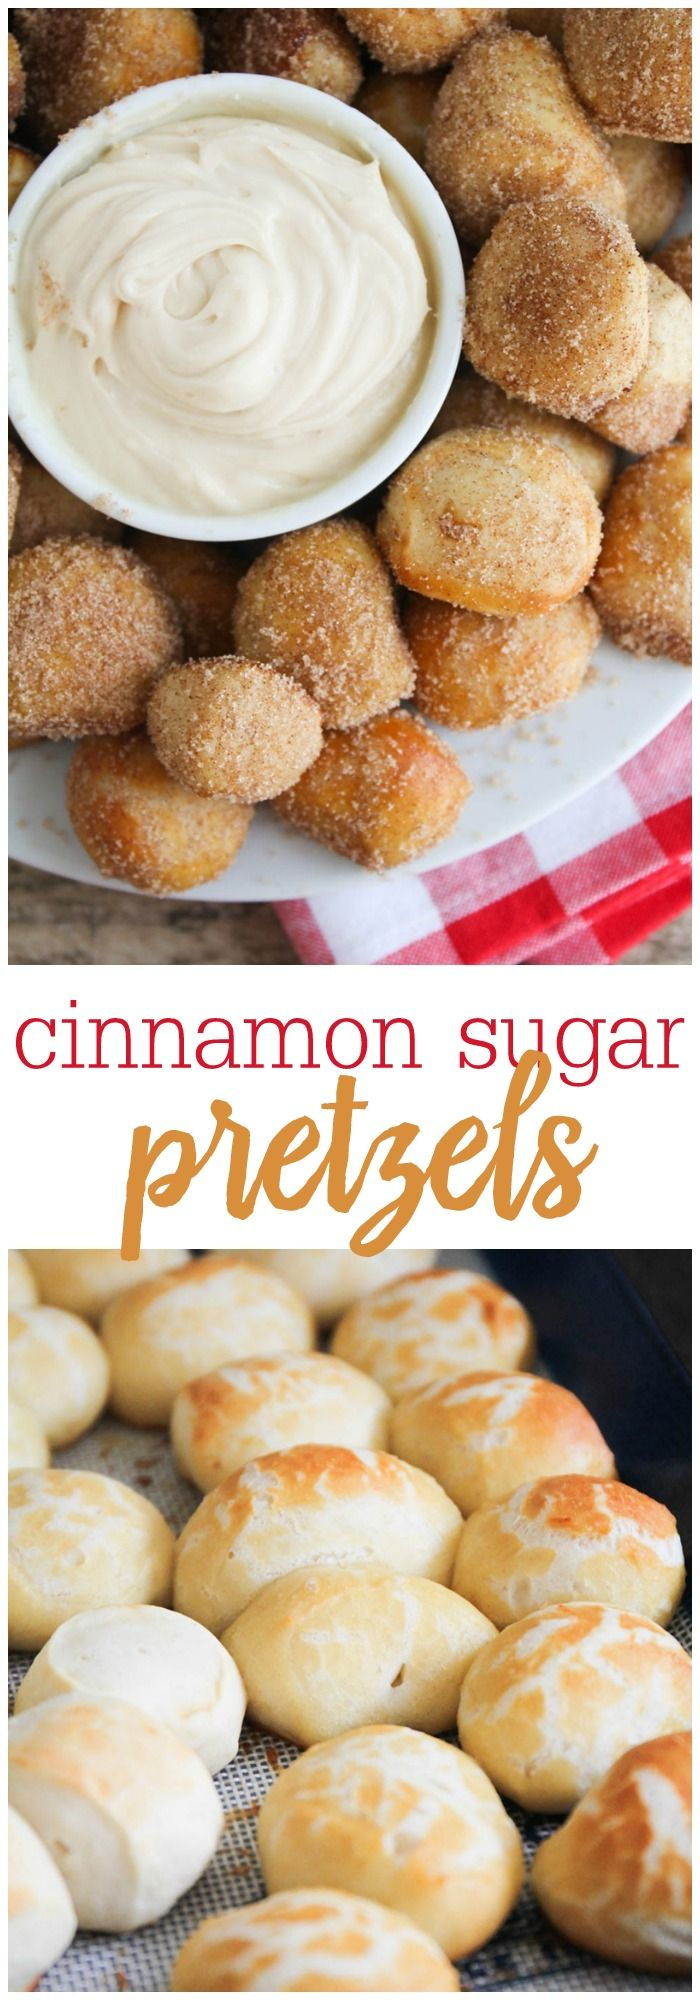 Cinnamon Sugar Pretzel Bites - copycat Auntie Anne's pretzels! These are the best!